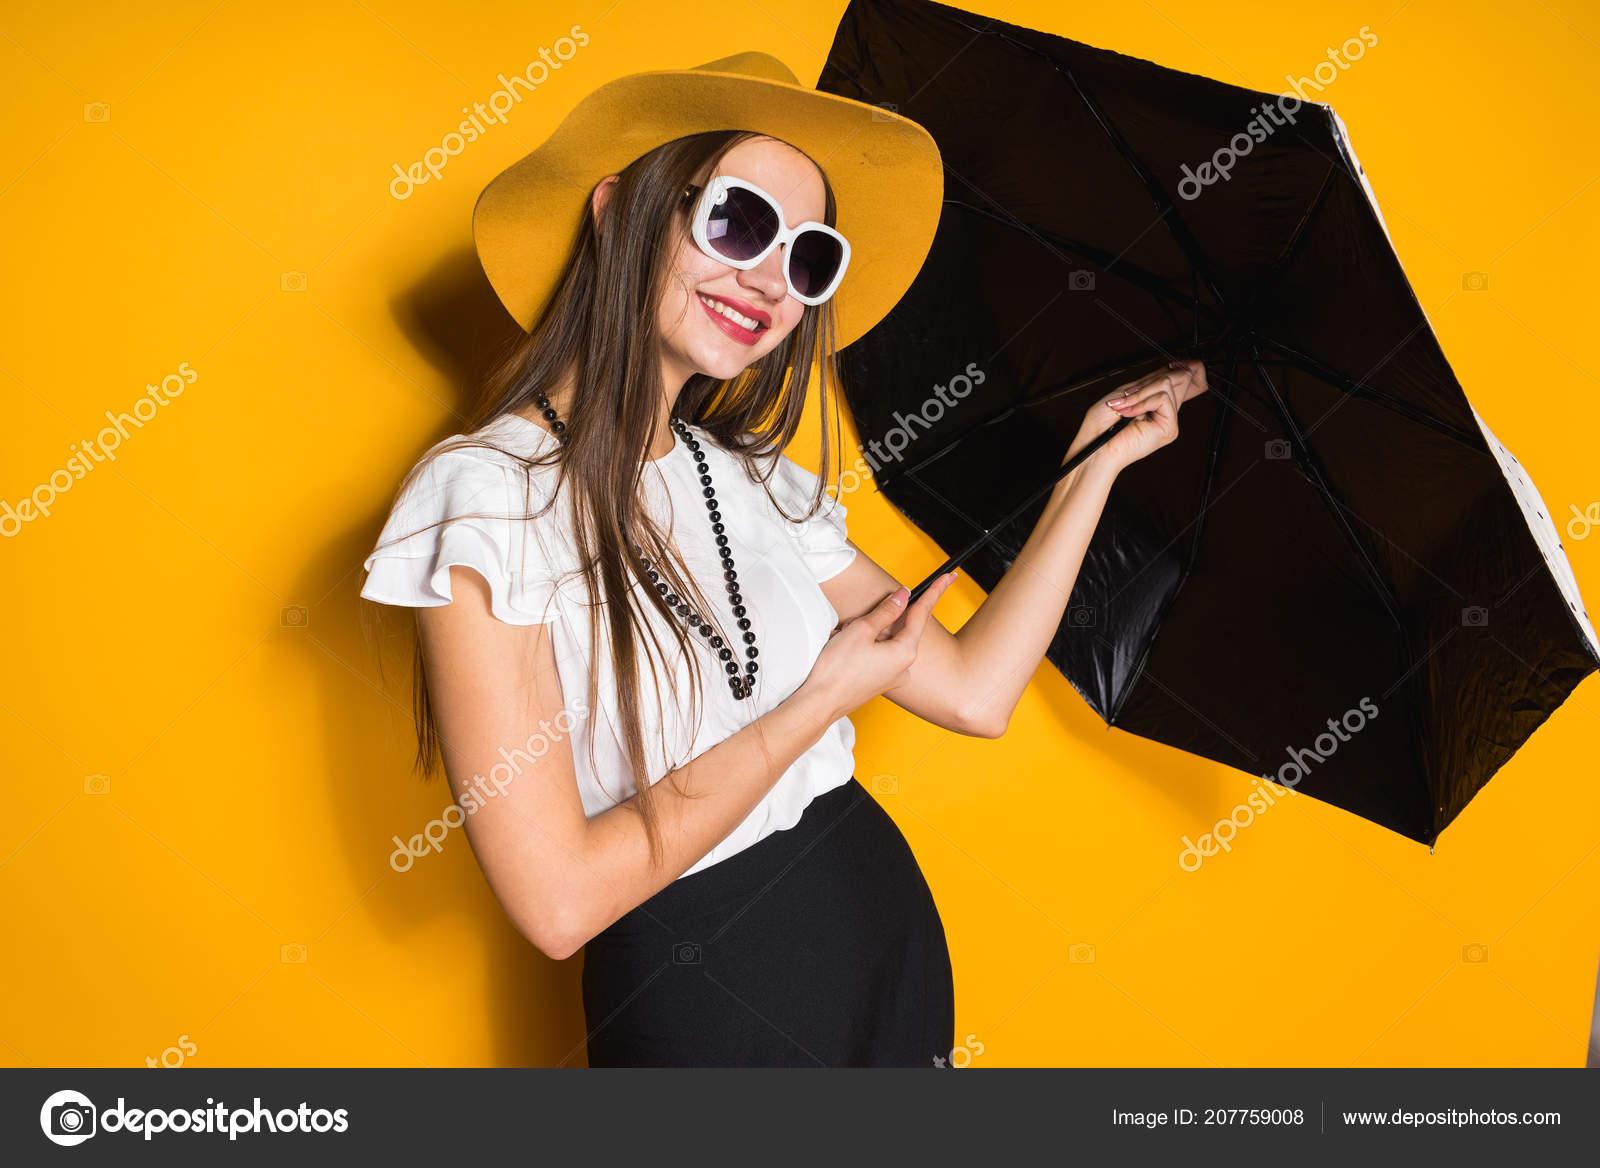 a36d705edb Χαμογελώντας αυτοπεποίθηση μακρυμάλλης κορίτσι μοντέλο στο καπέλο και γυαλιά  ηλίου κρατά ομπρέλα και θέτοντας σε κίτρινο φόντο — Εικόνα από ...